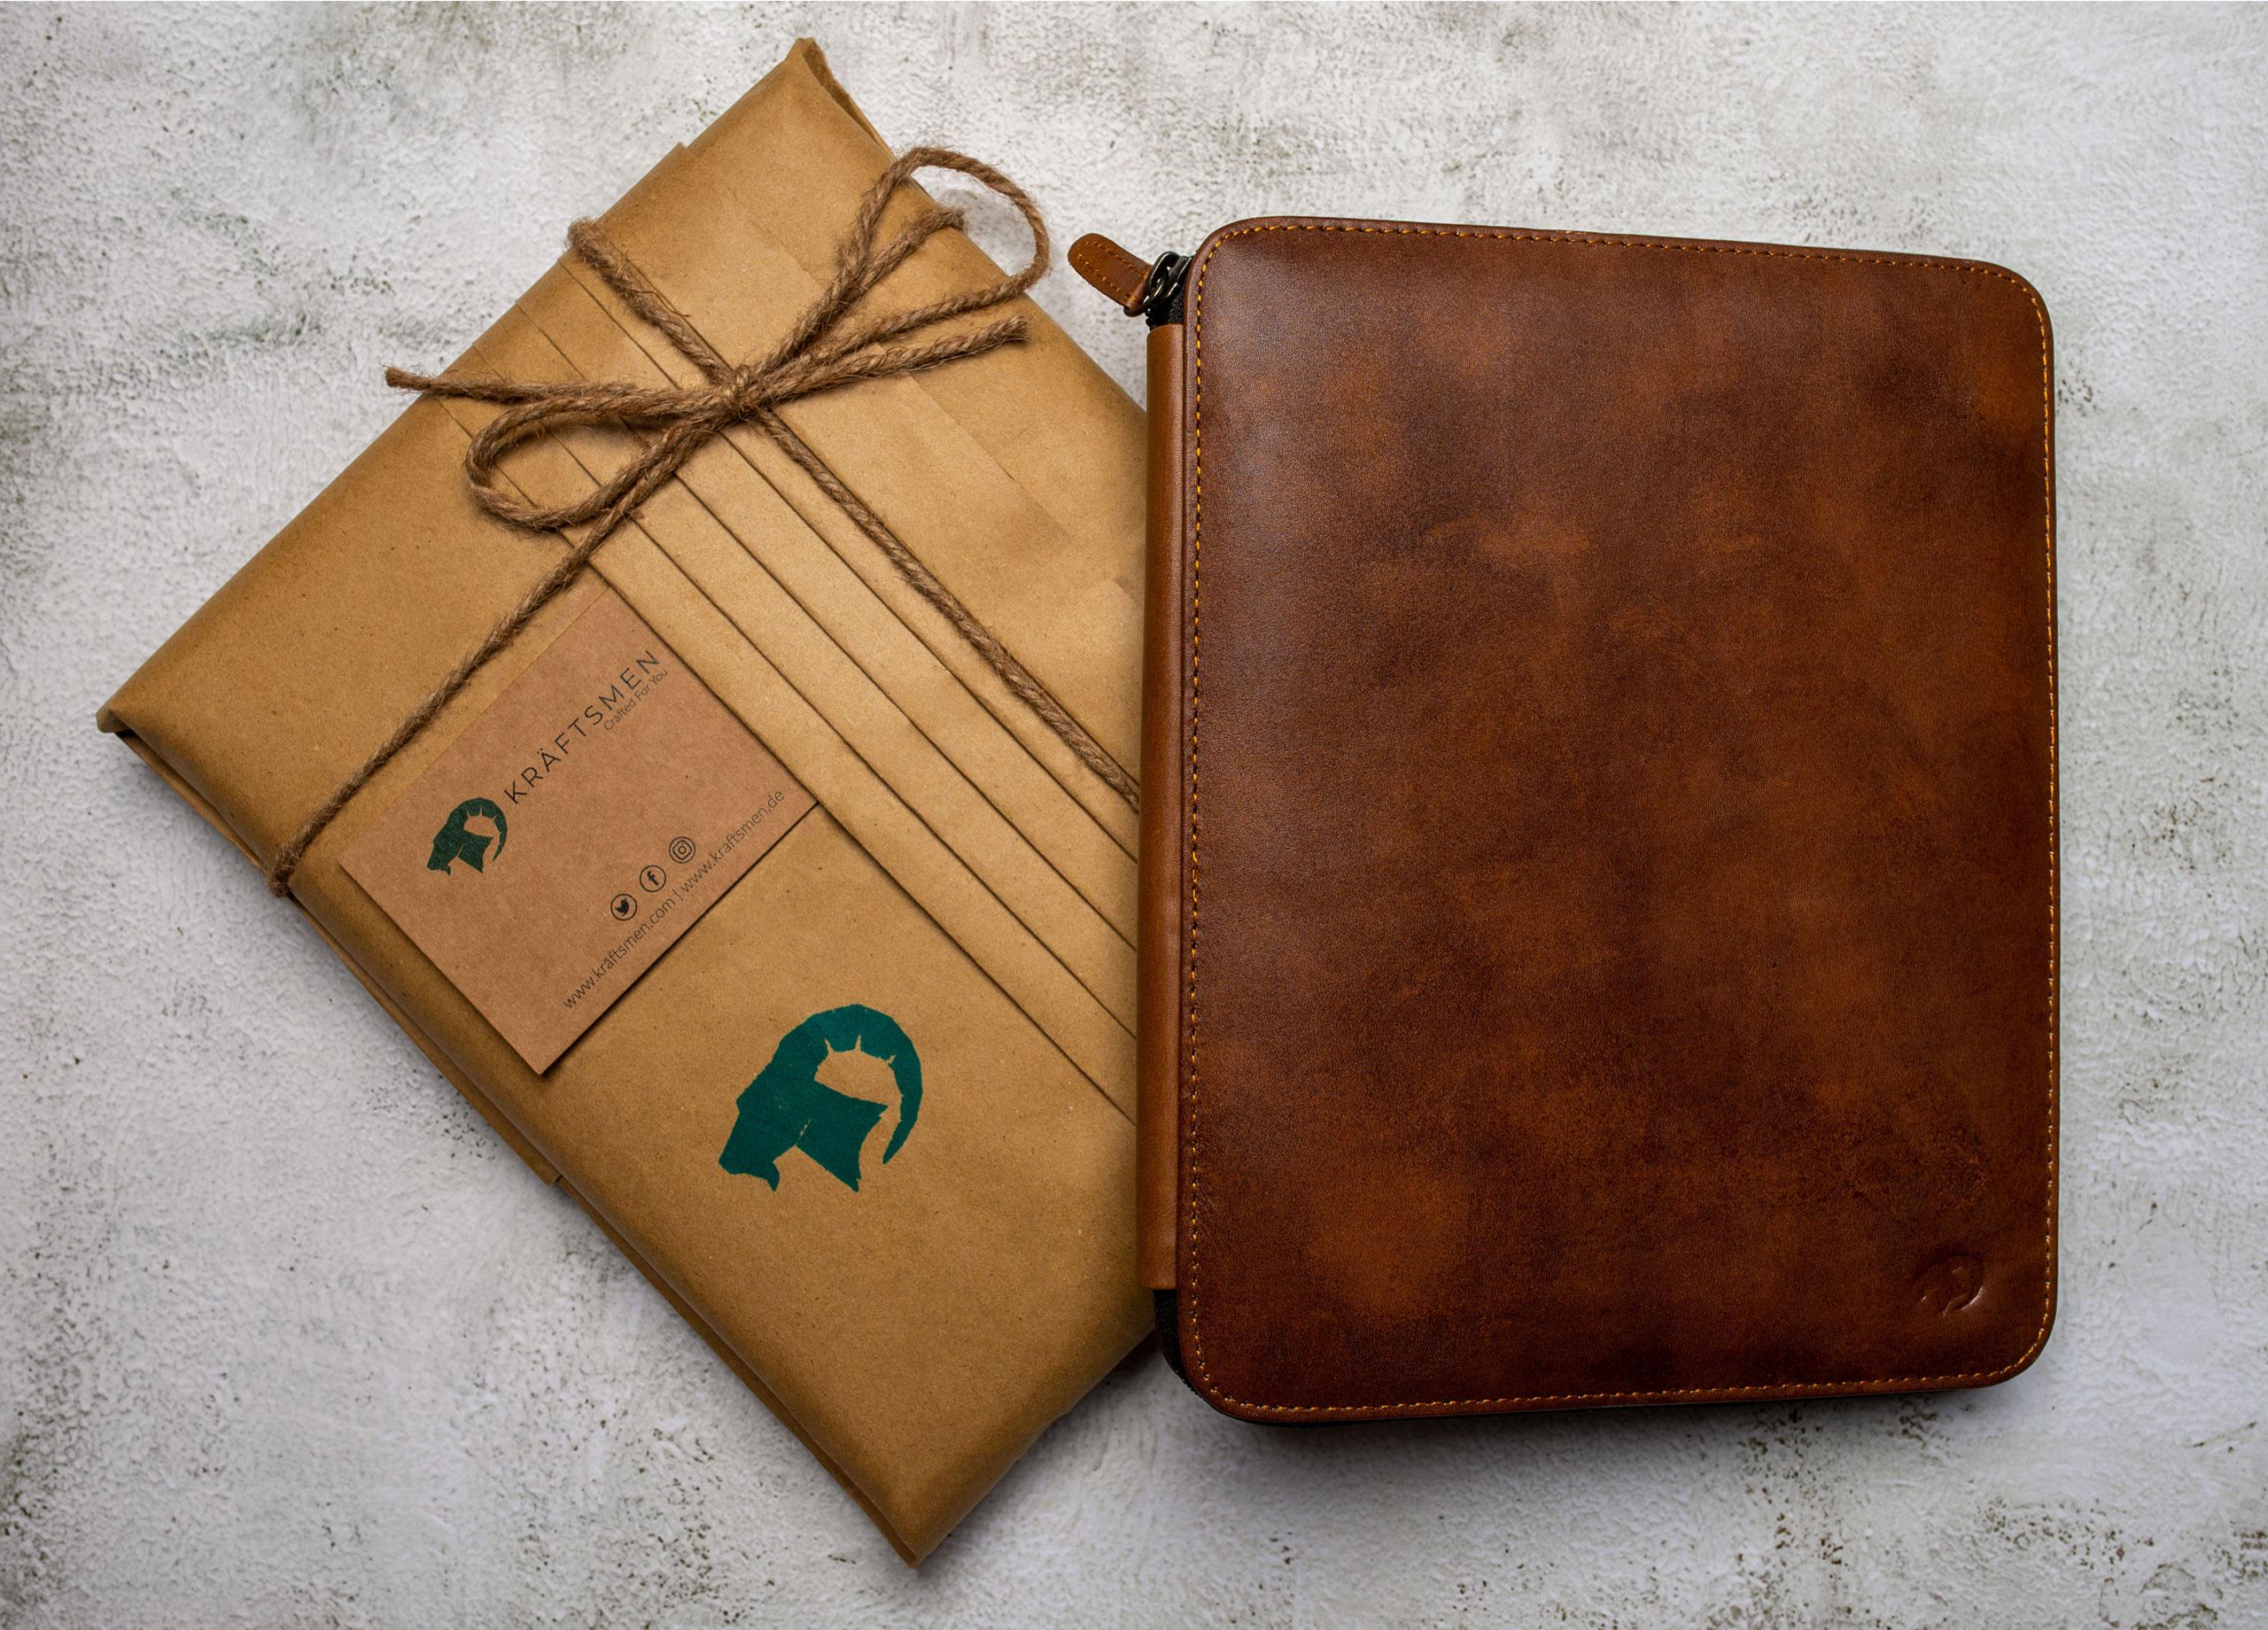 Leather Portfolio with craft packaging by Kraftsmen